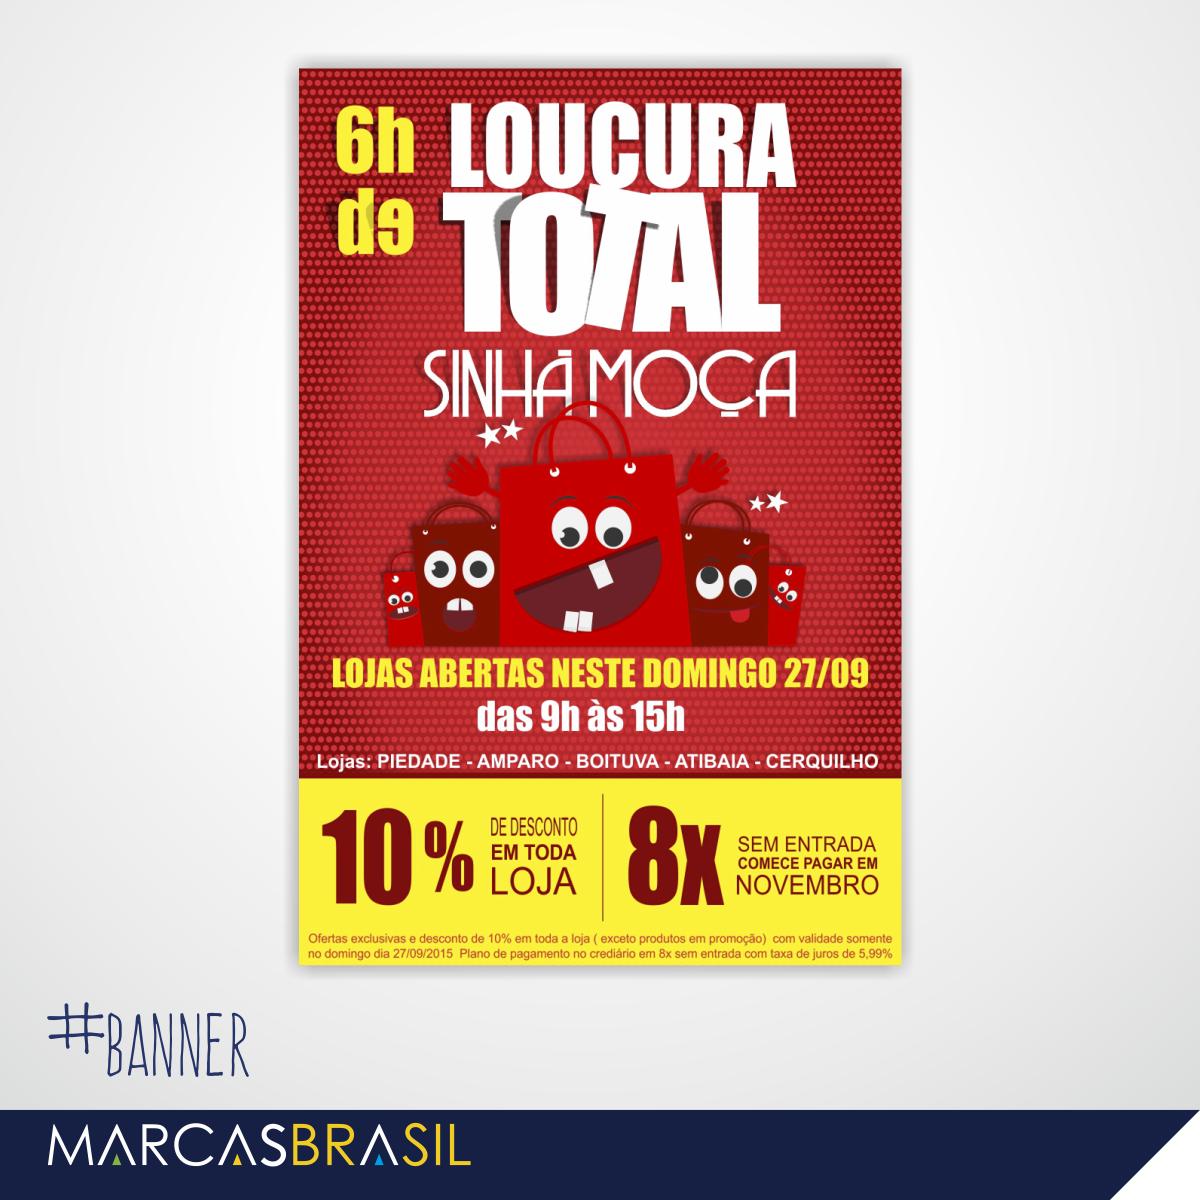 Banner – Sinhá Moça > Desenvolvimento de banner para as lojas Sinhá Moça < #banner #marcasbrasil #agenciamkt #publicidadeamericana